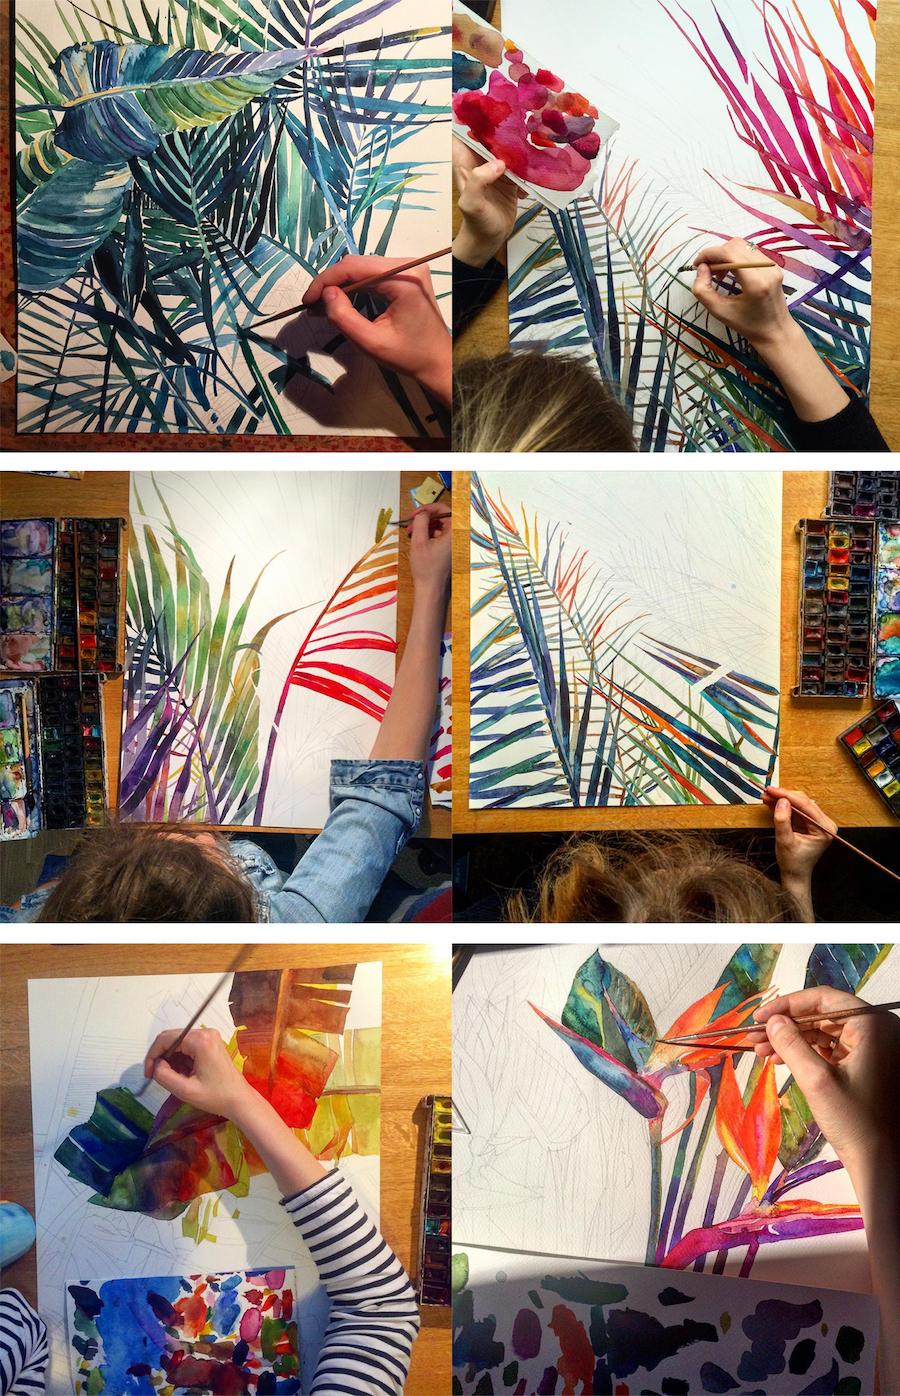 Mesmerizing Watercolor Paintings by Maja Wronska